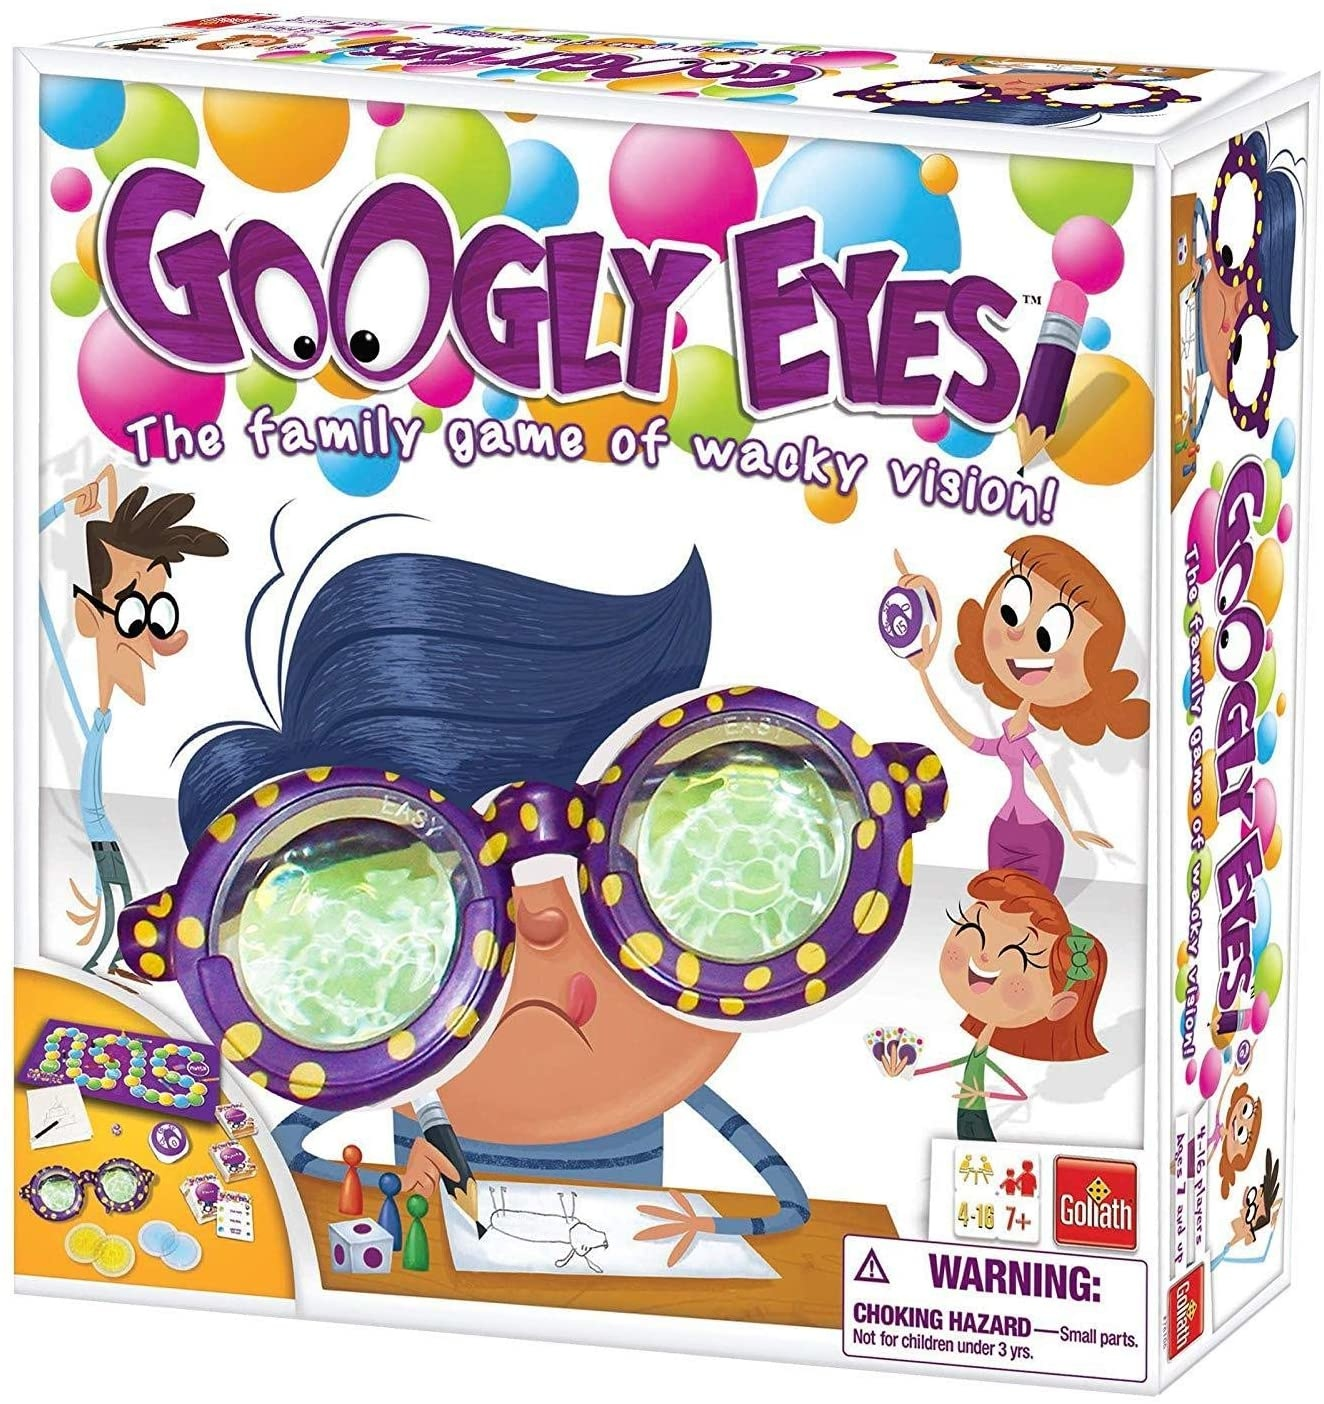 Googl Eyes